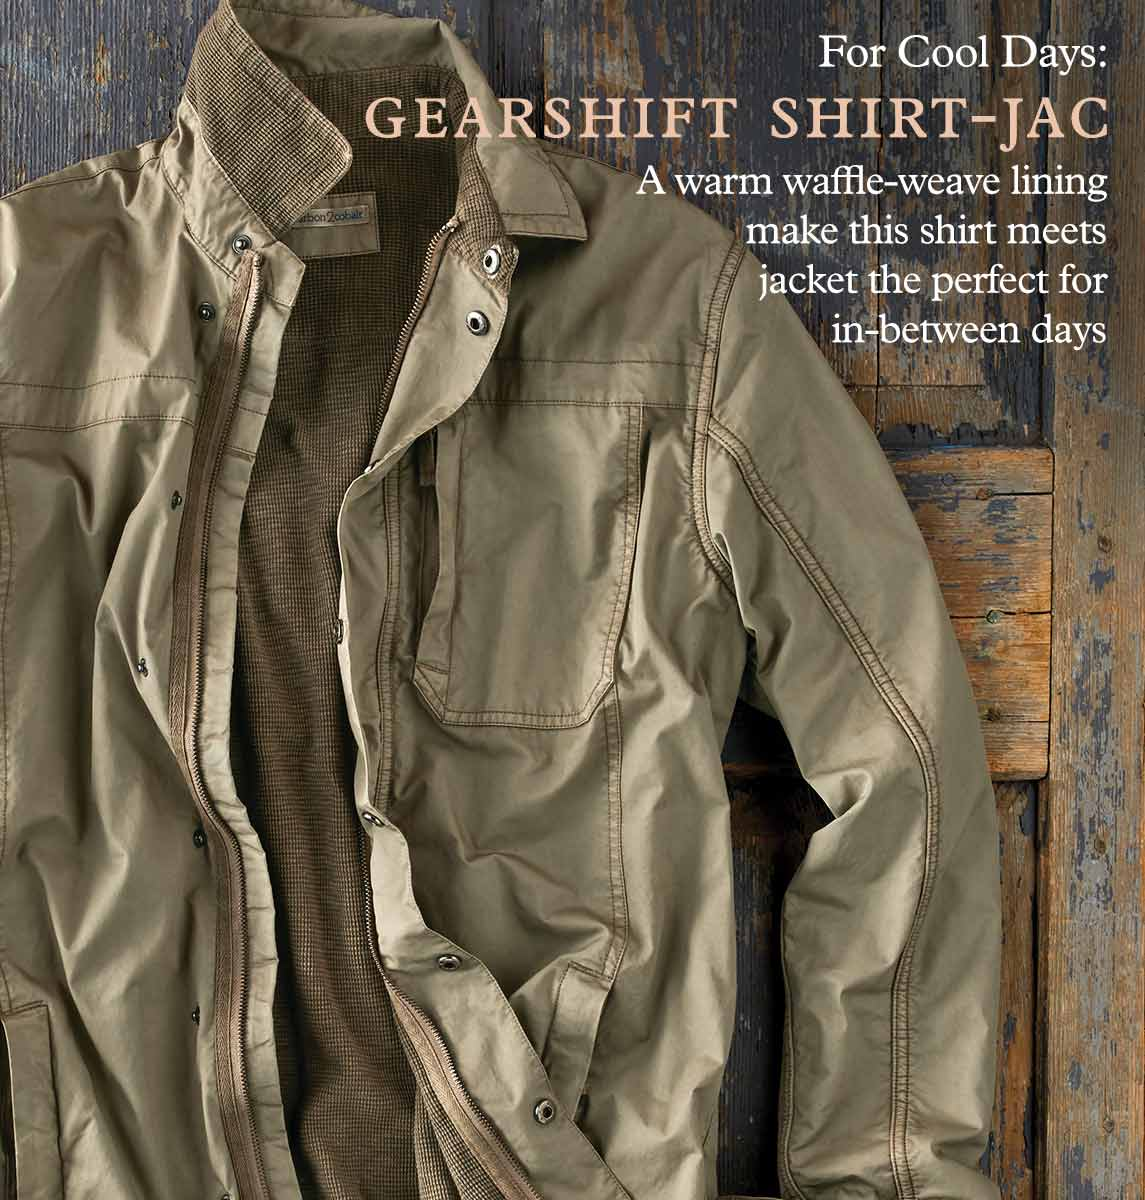 Gearshift Shirt-Jac